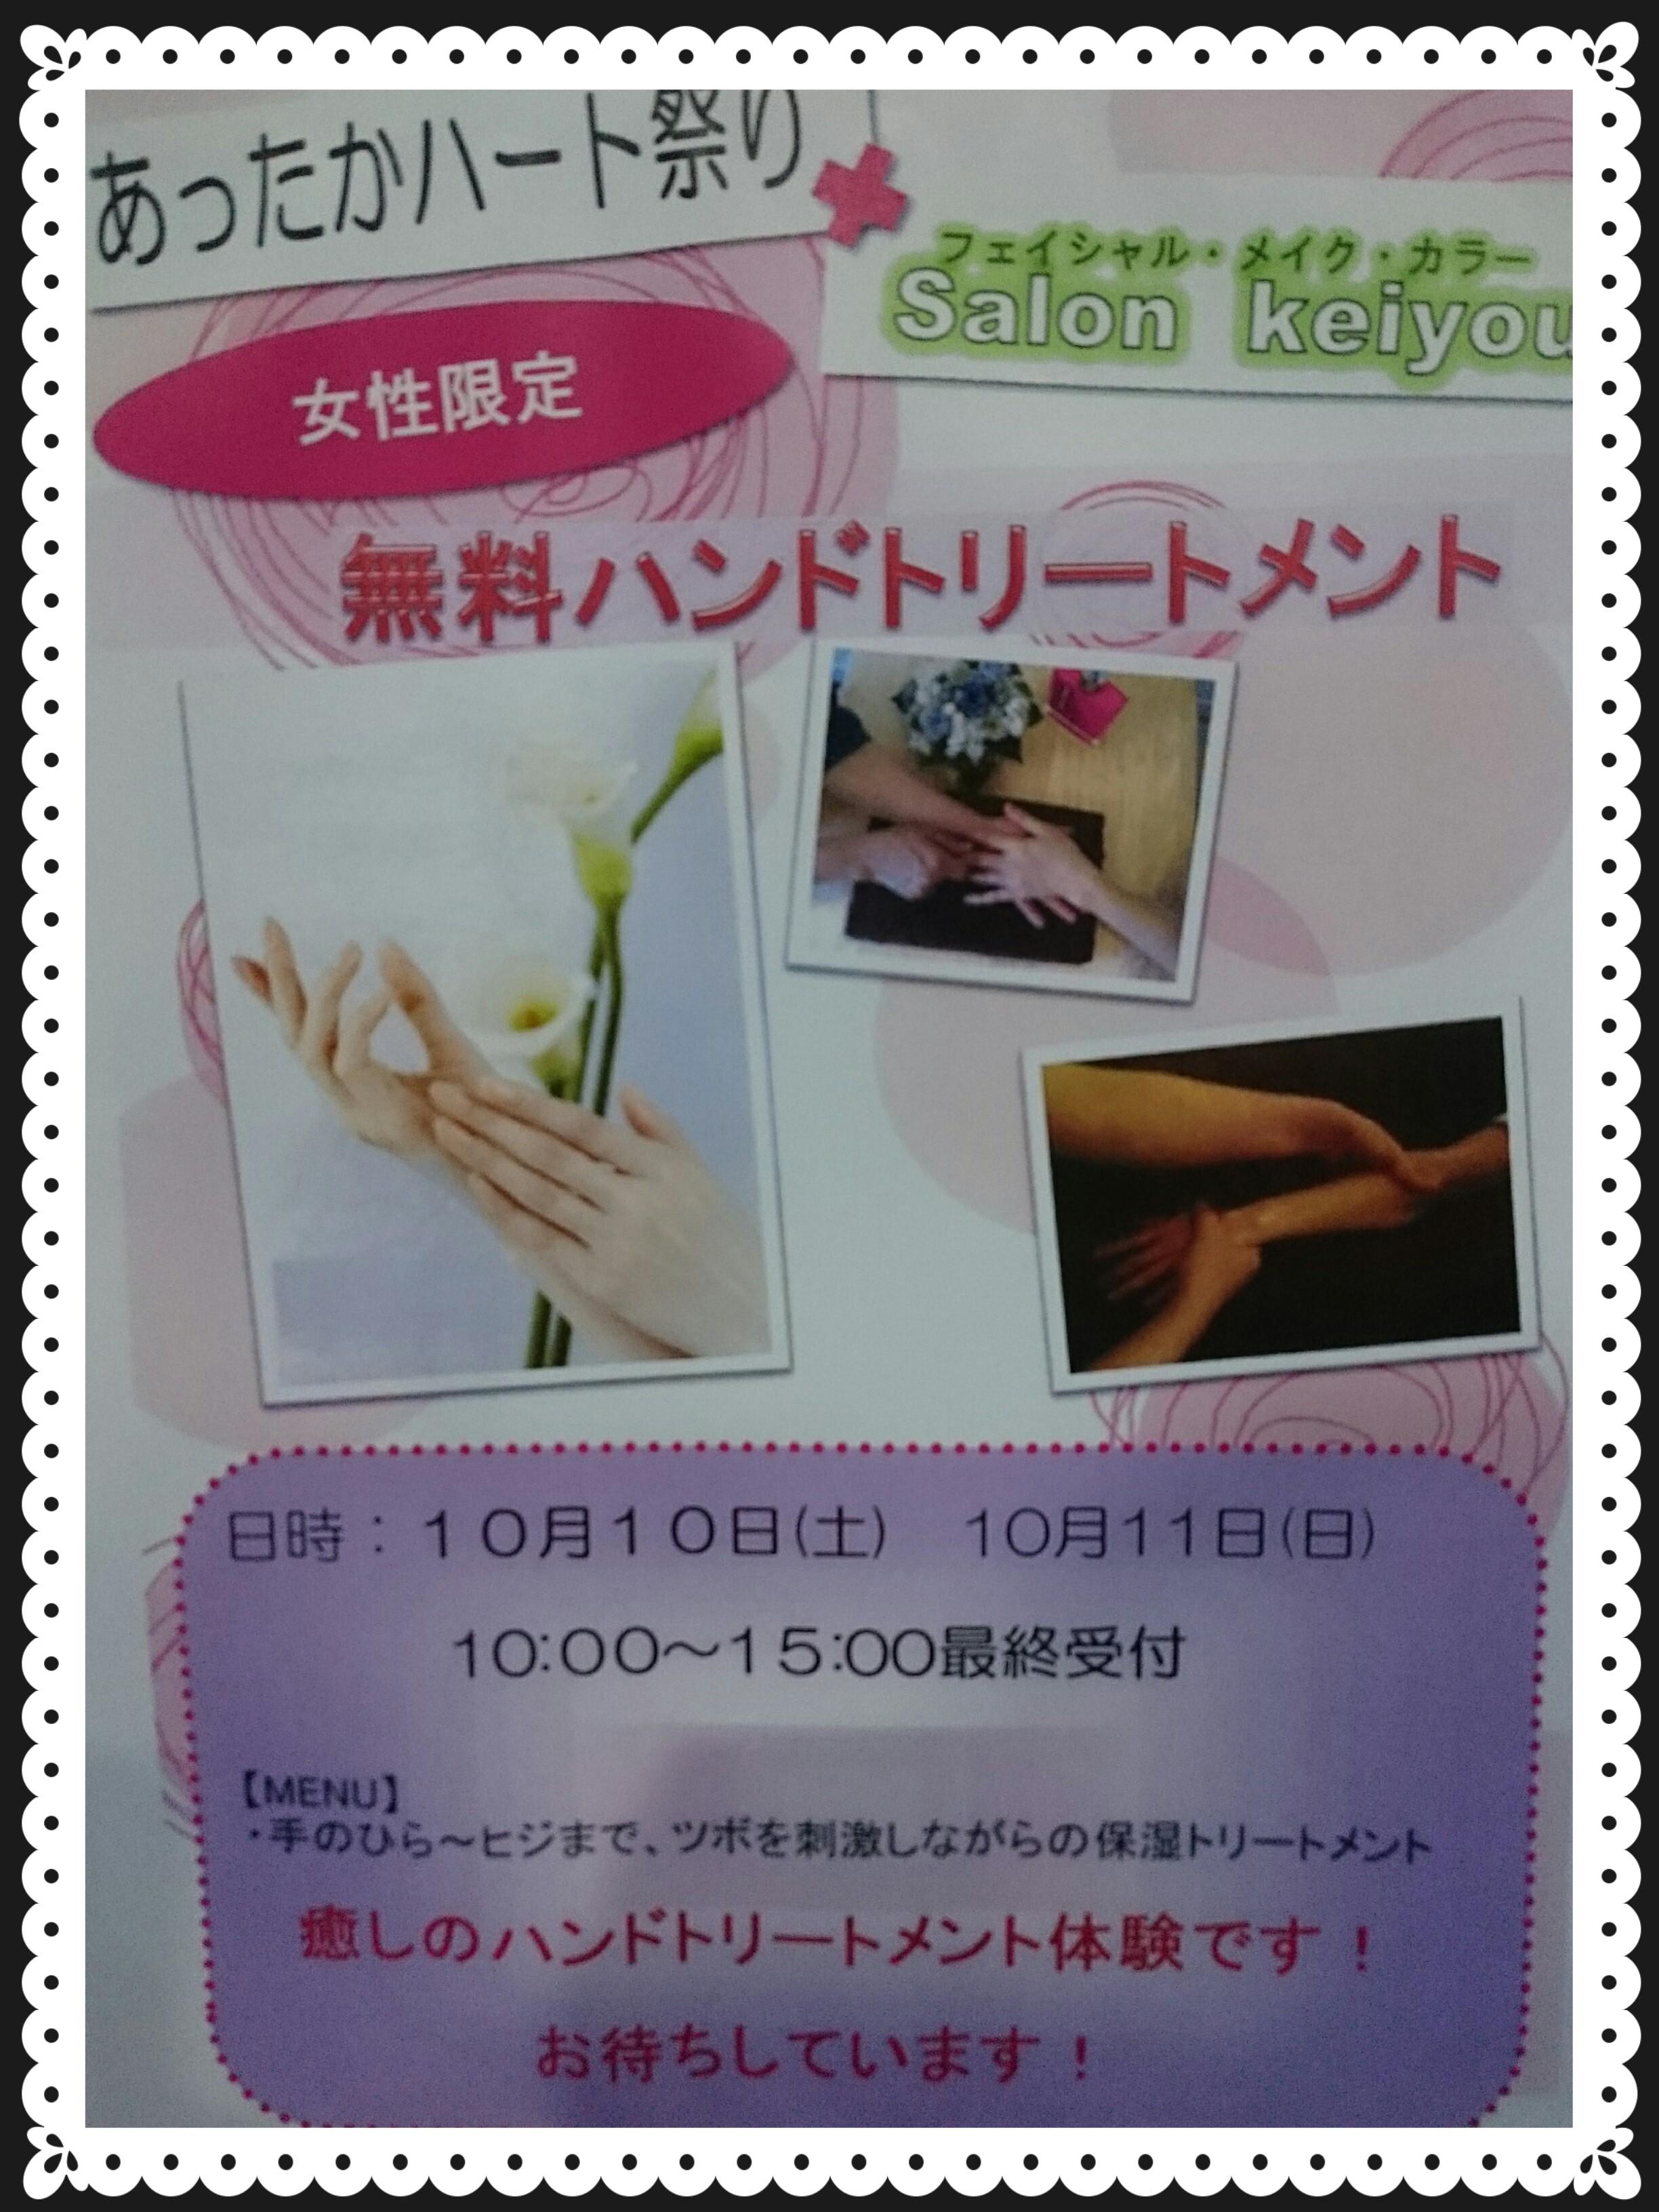 moblog_99453426.jpg